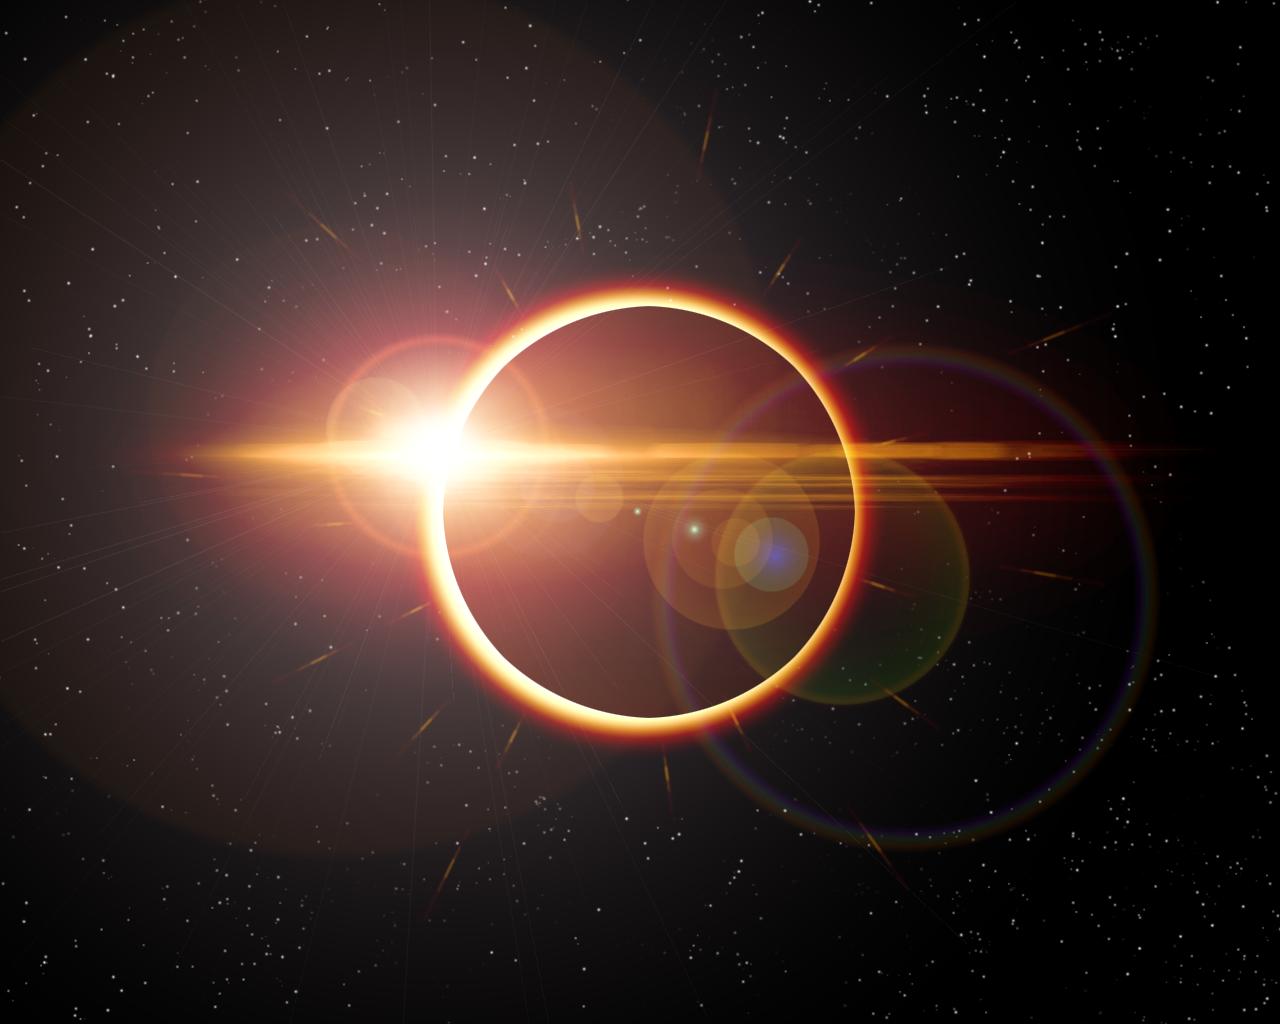 Pin by Diane Coddington on eclipse shirts Solar lunar eclipse 1280x1024